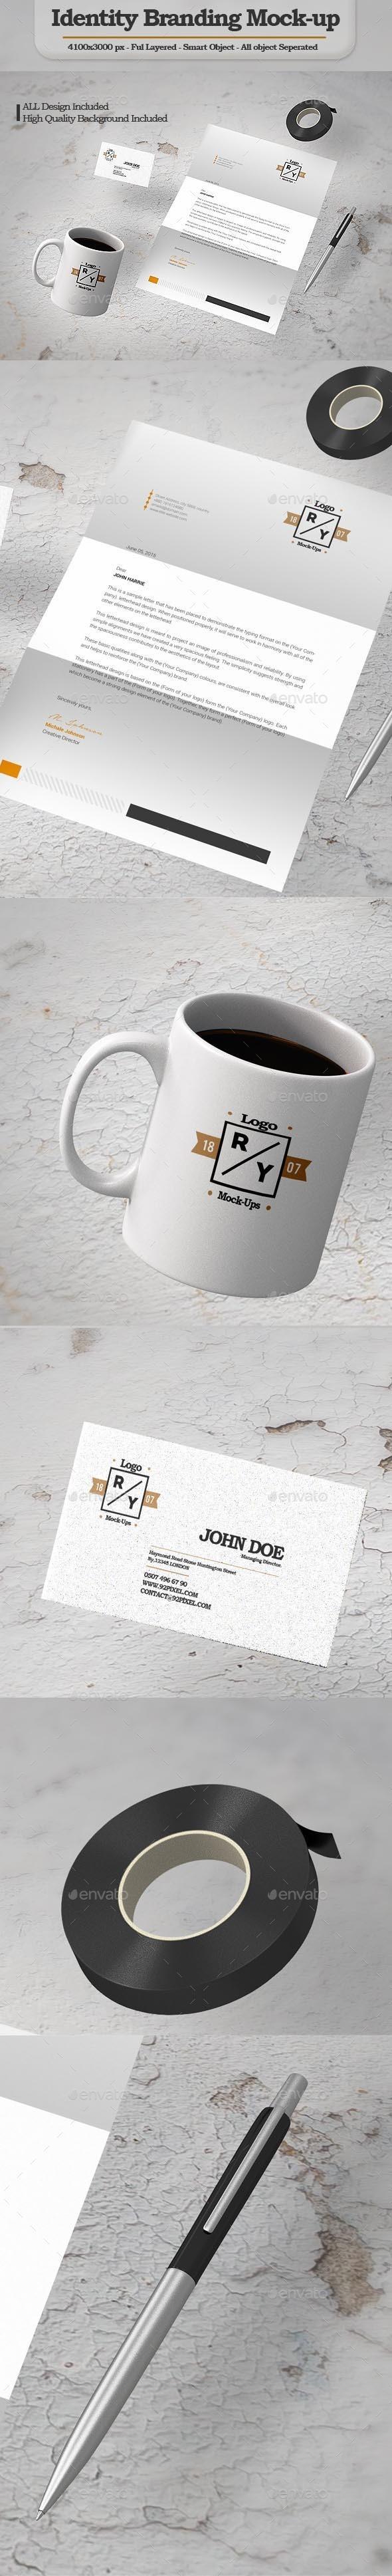 Identity Branding Mock-Up (Stationery)